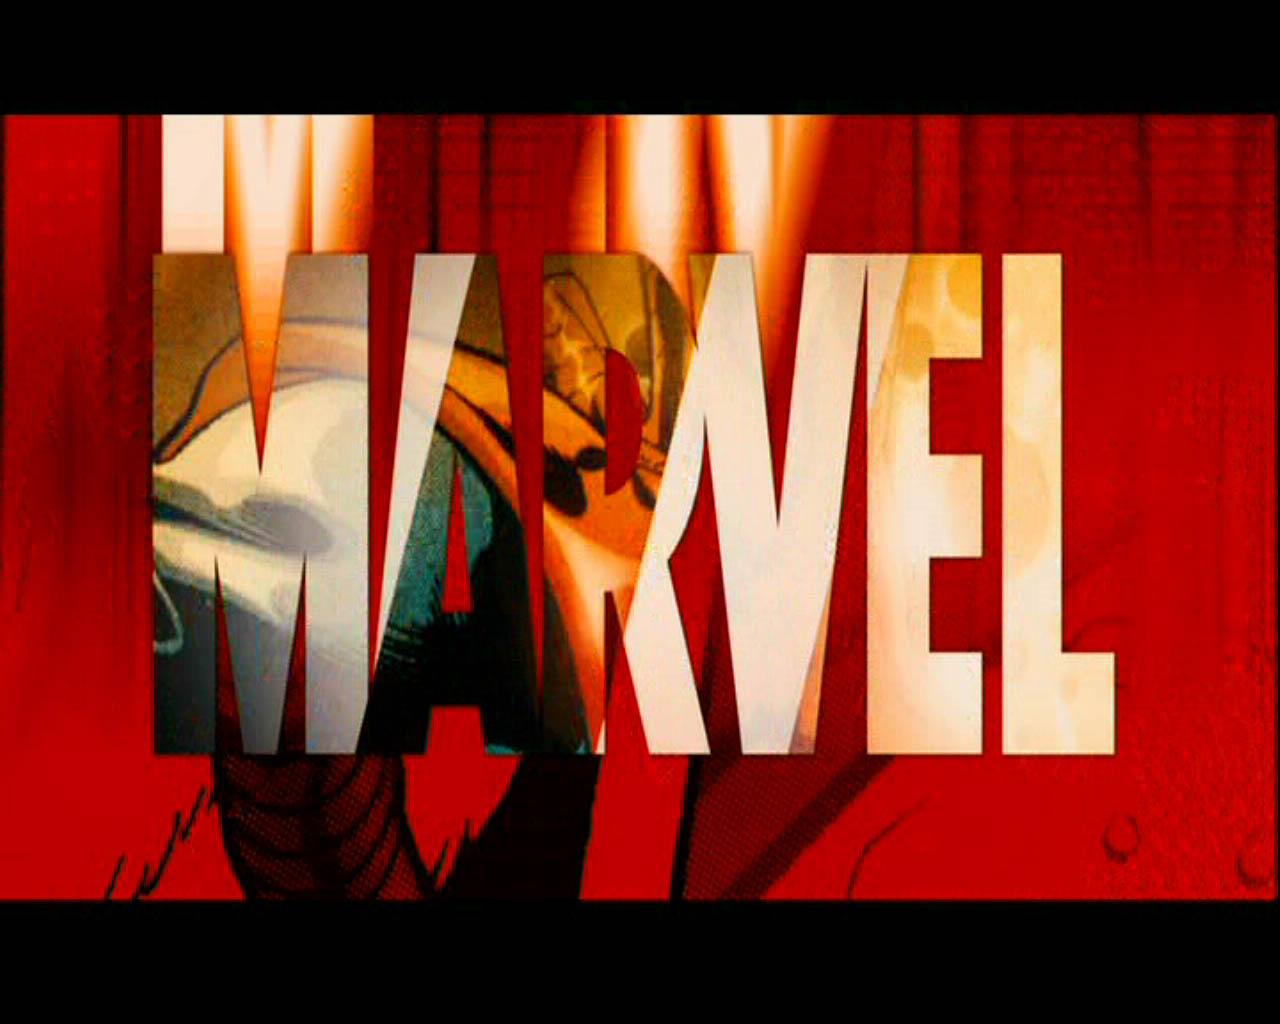 Marvel Logo 壁紙画像 Pchdwallpaper Com Pchdwallpaper Com